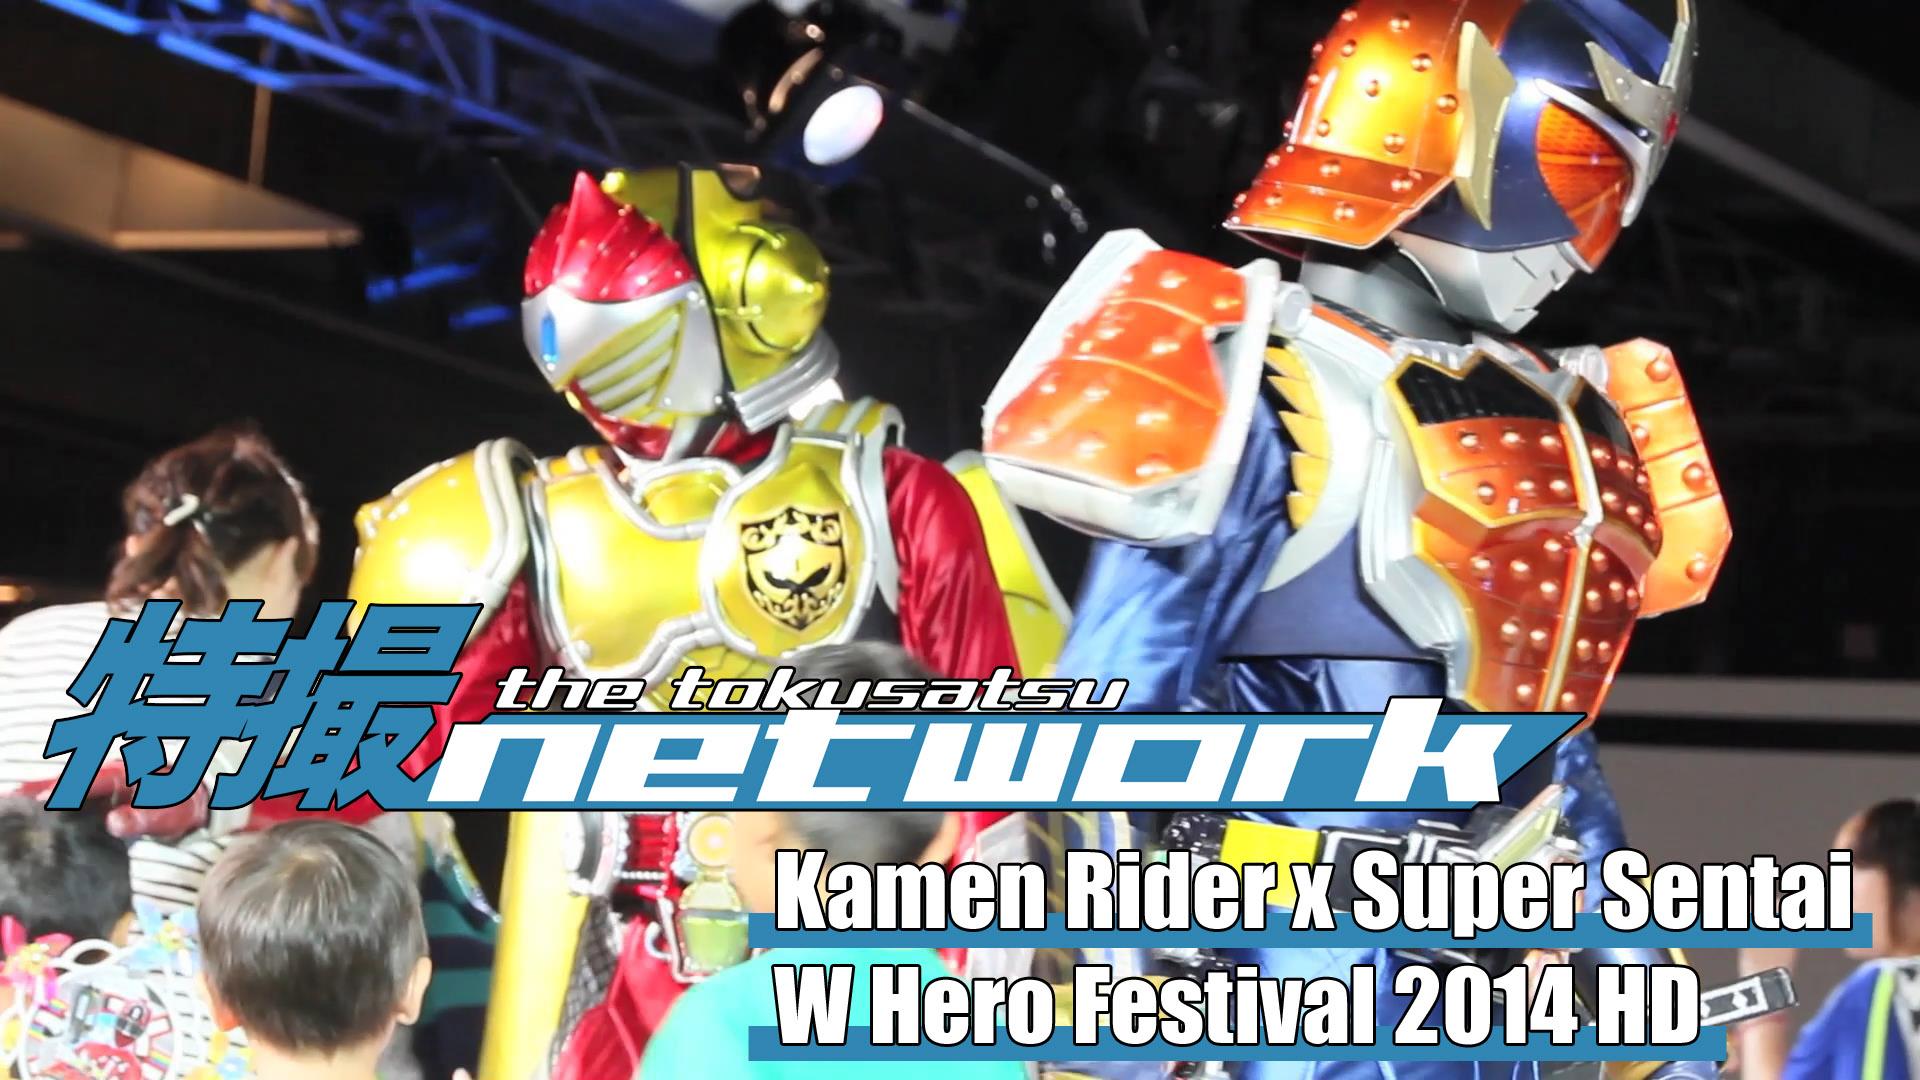 VIDEO: Kamen Rider x Super Sentai W Hero Festival 2014